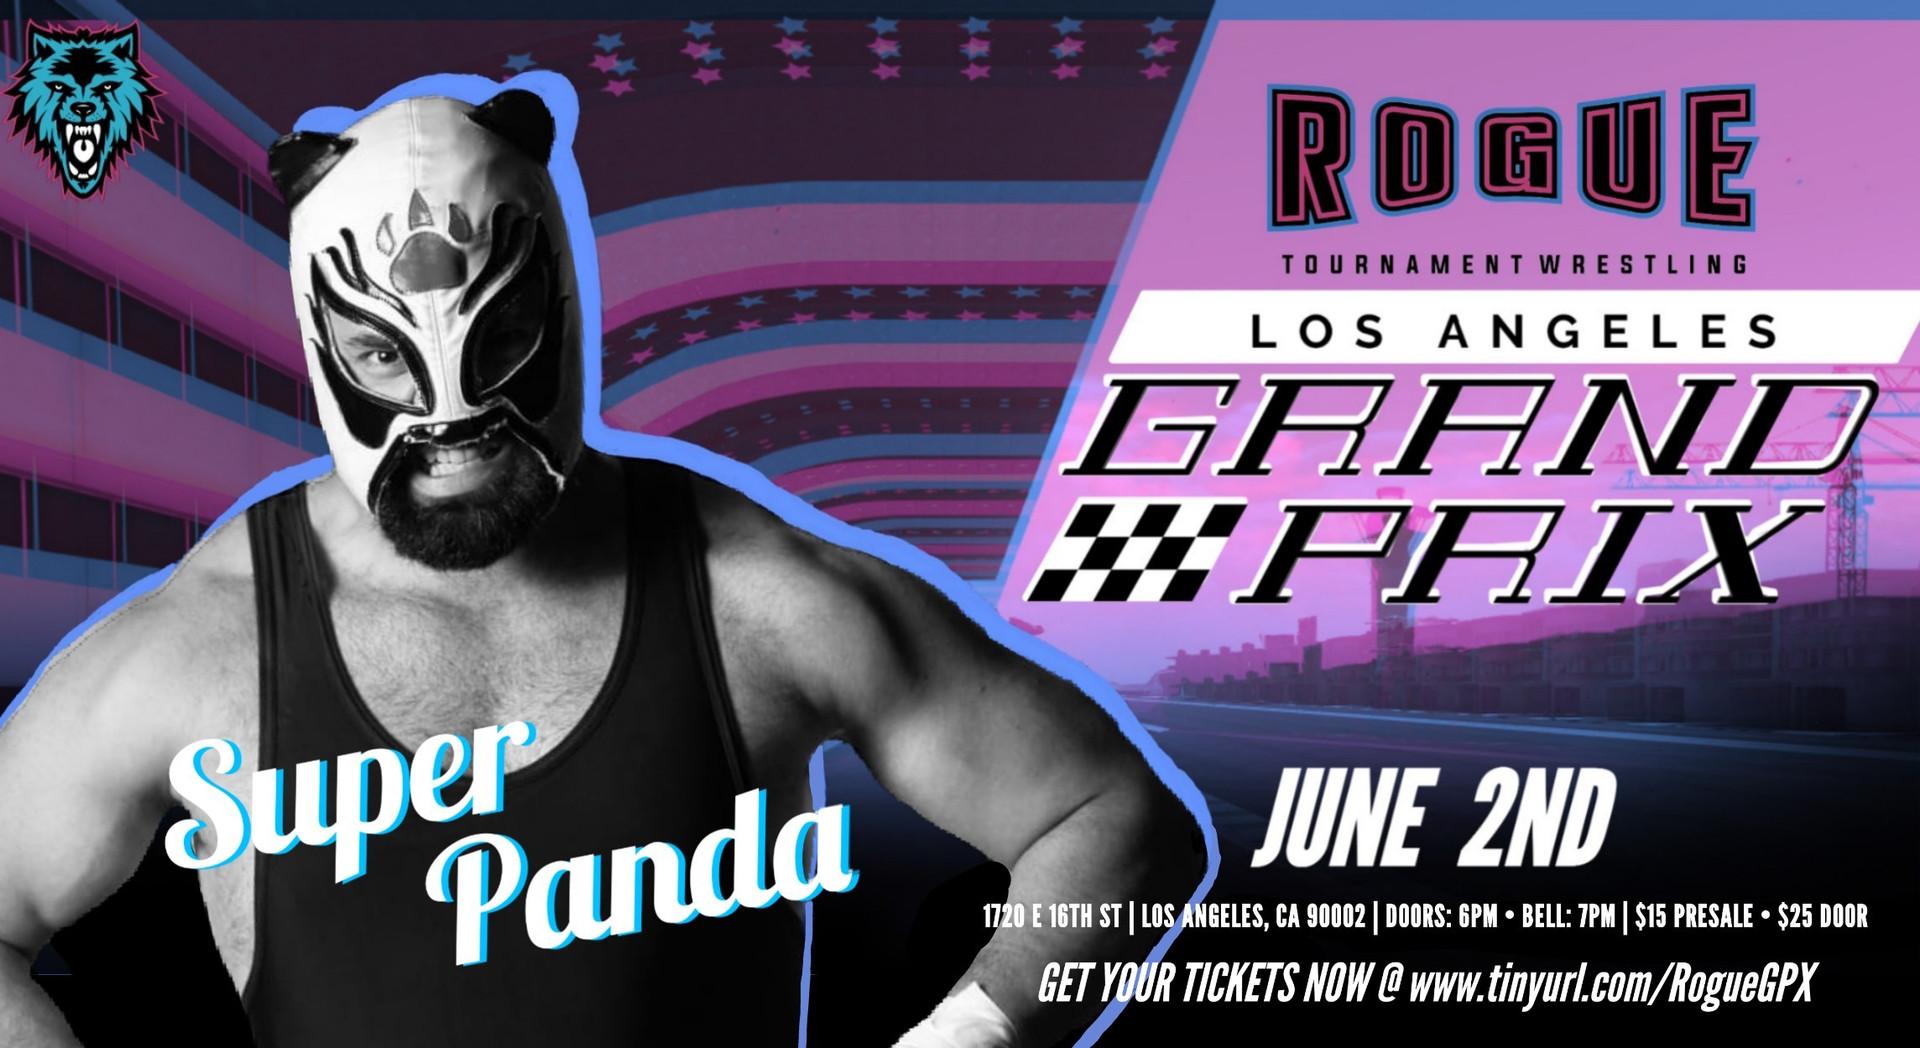 Super_Panda_Rogue_Wrestling_Los Angeles_